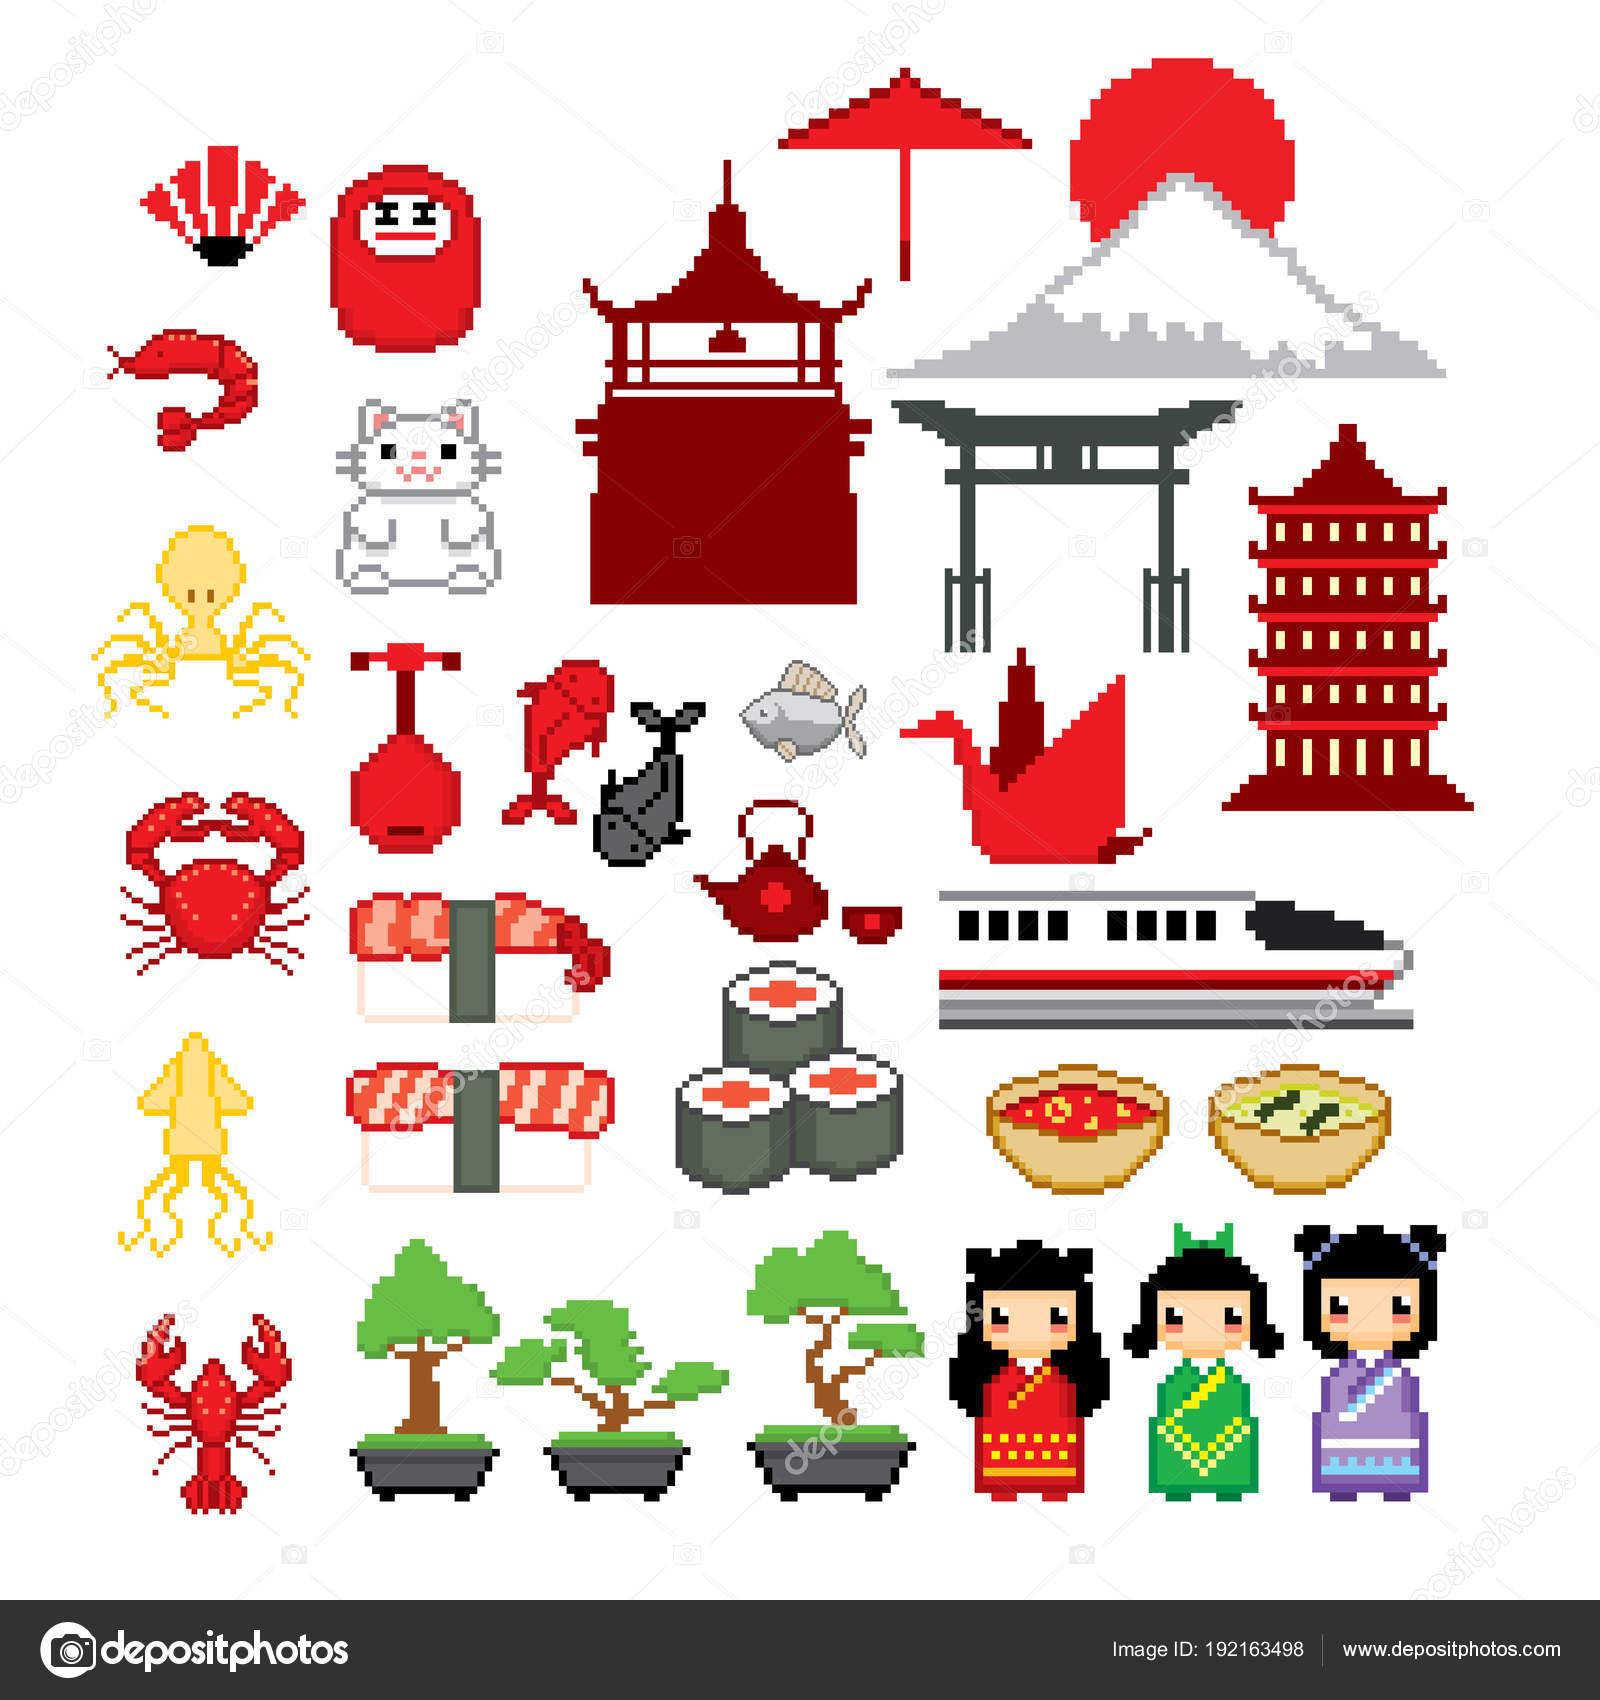 Japan Culture Icon Set Pixel Art Old School Computer Graphic 8